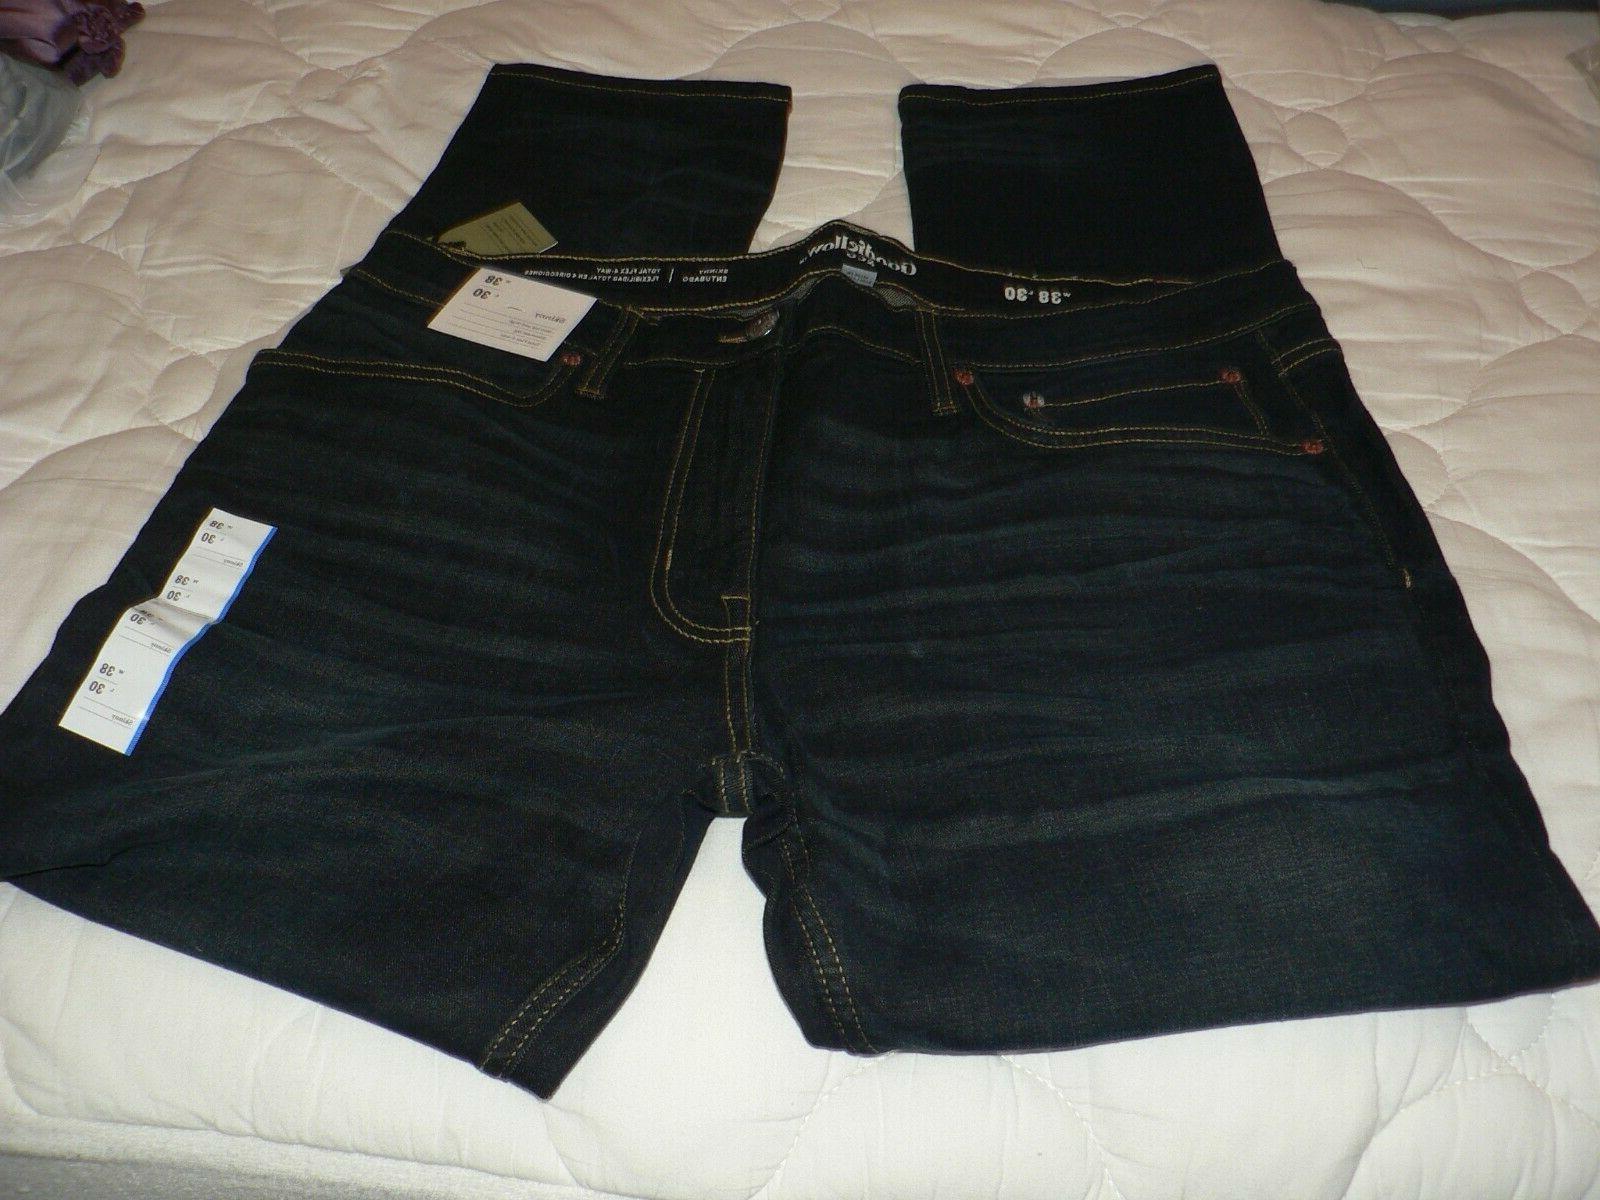 Goodfellow & Men's Jeans